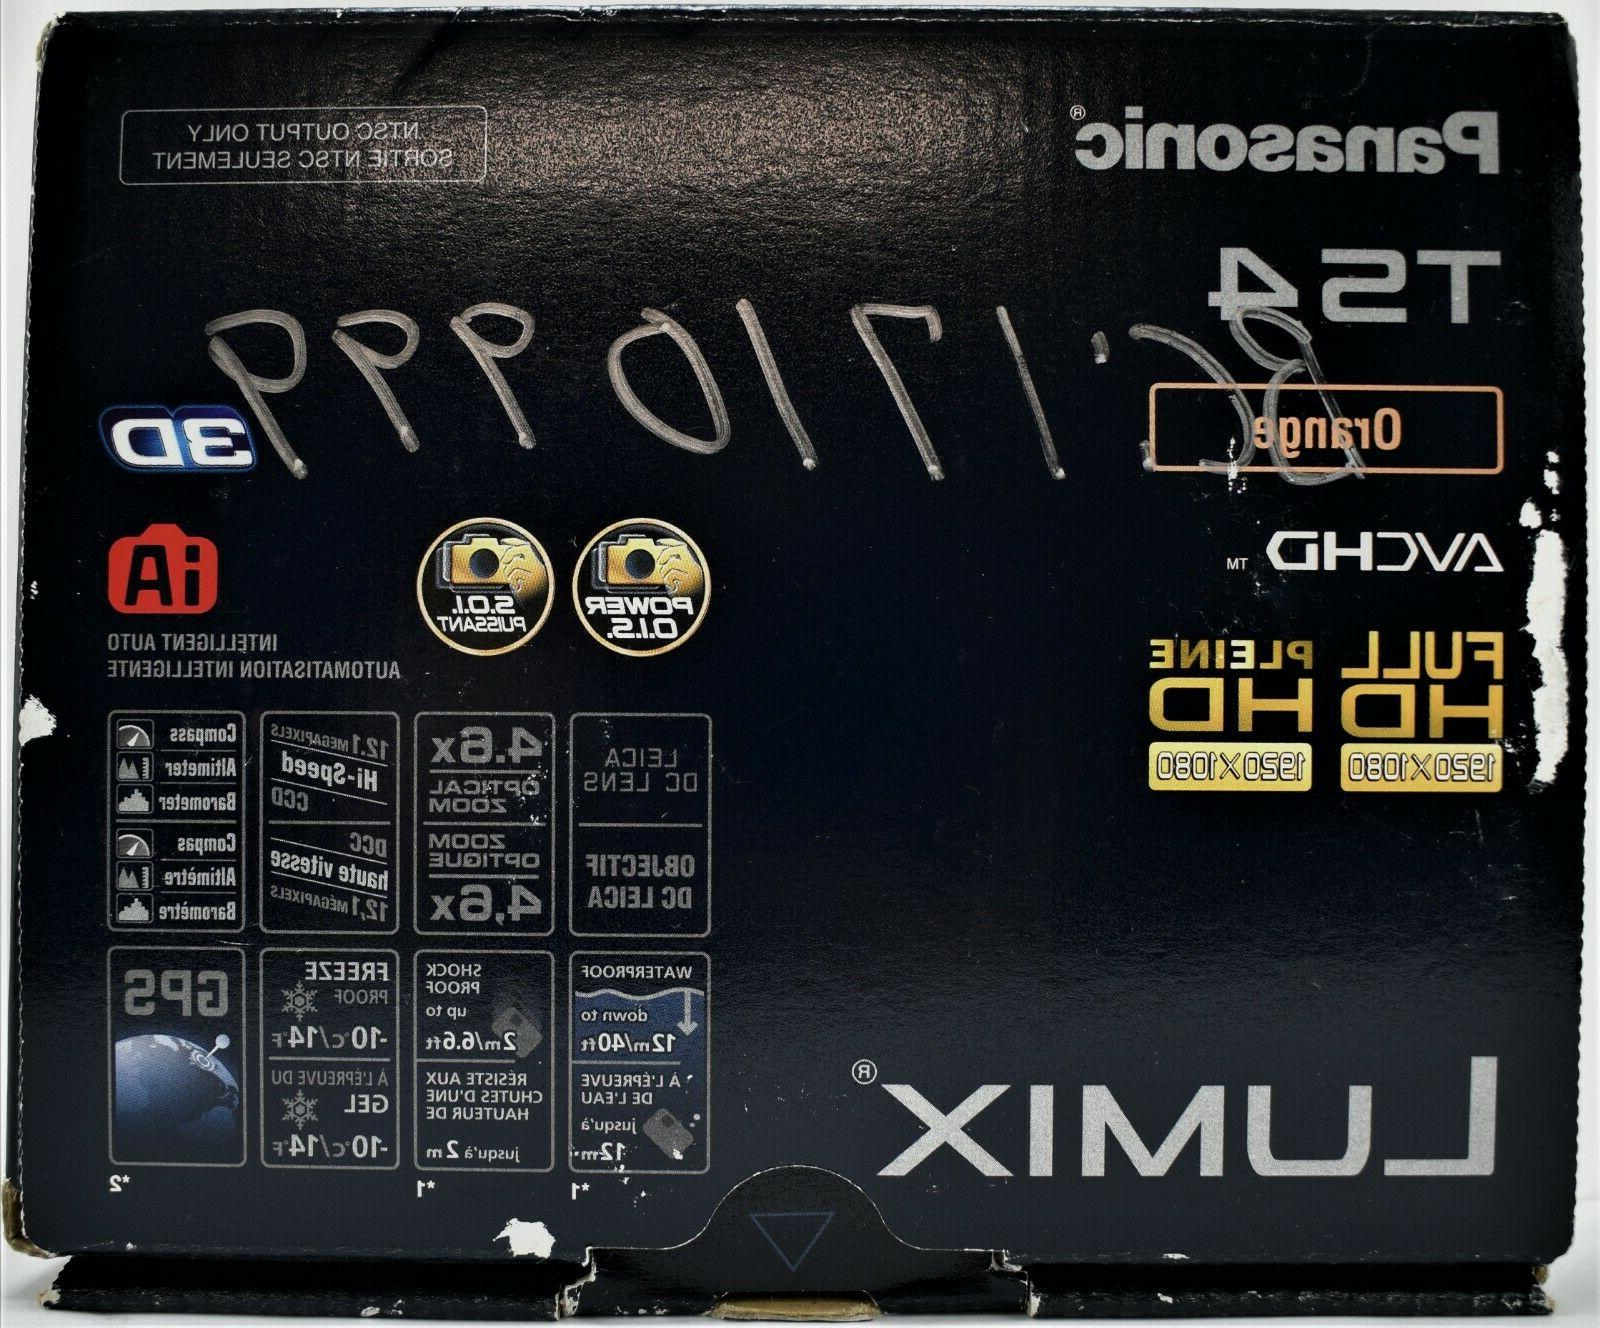 Panasonic LUMIX DMC-TS4 12.1MP Waterproof & Shockproof Digit